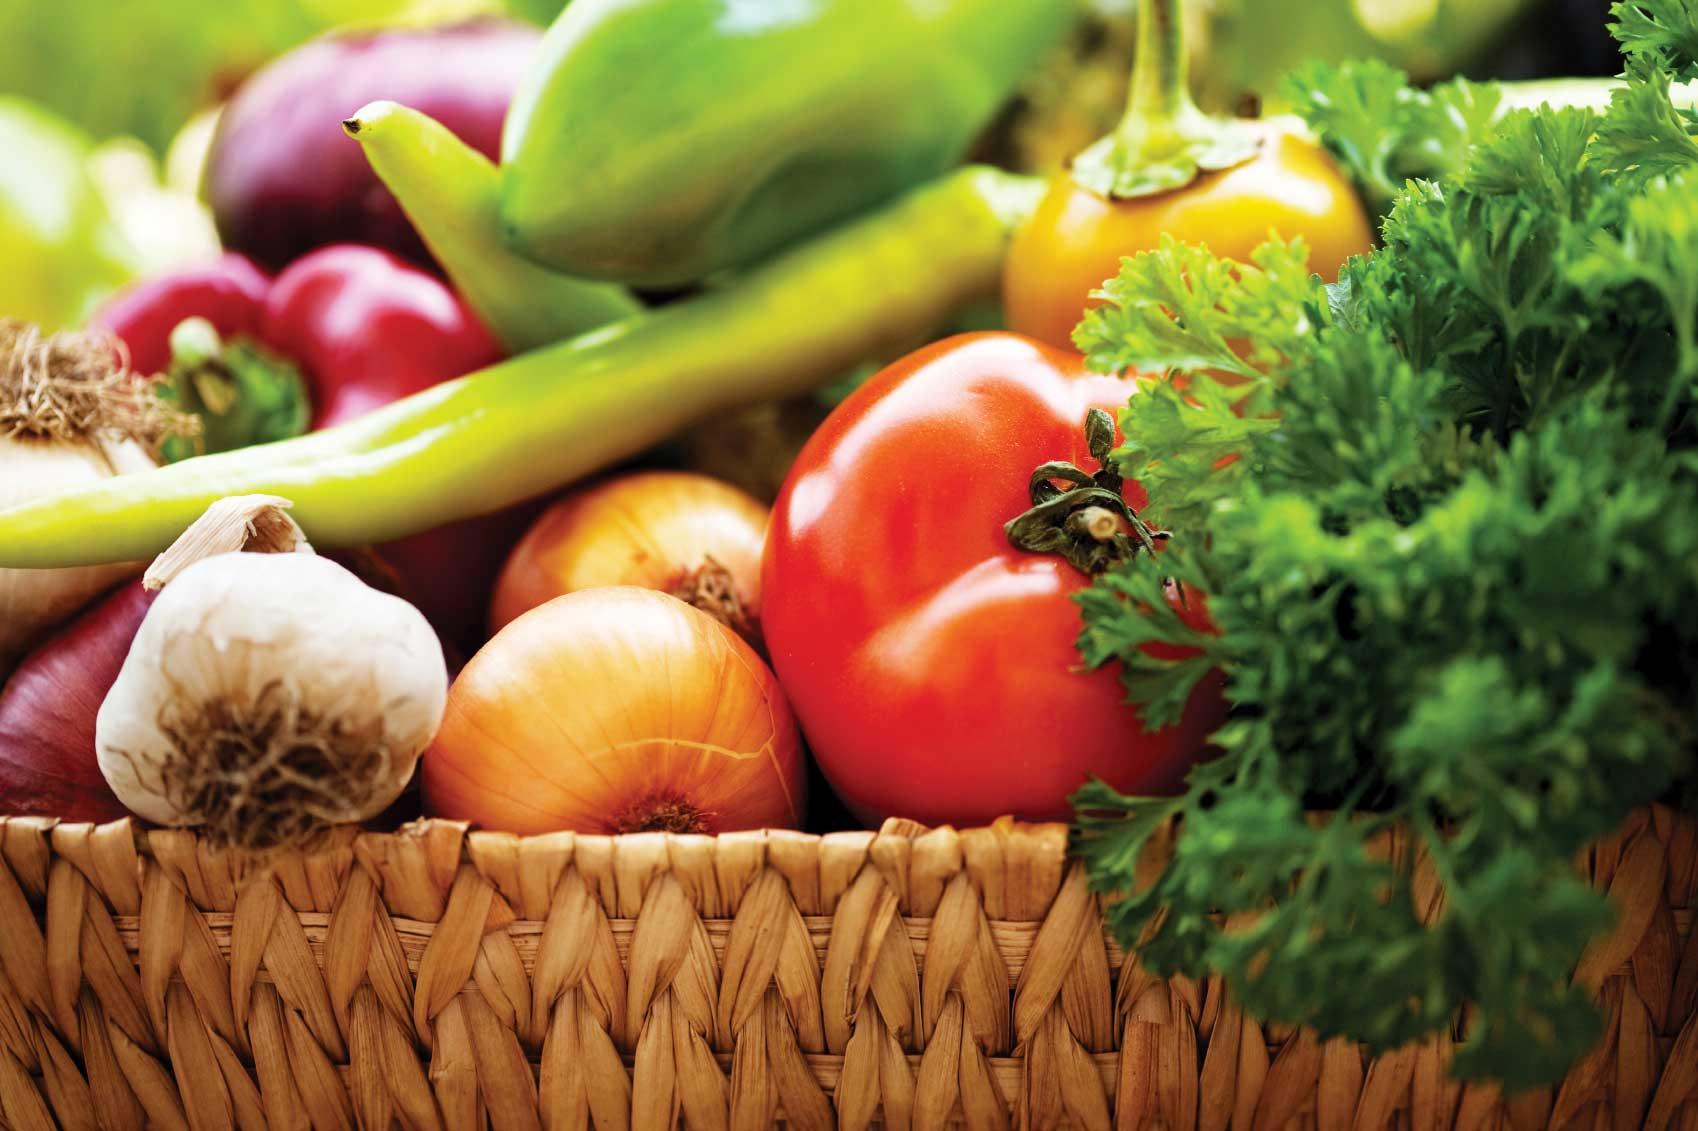 Organic food not healthier says fsa